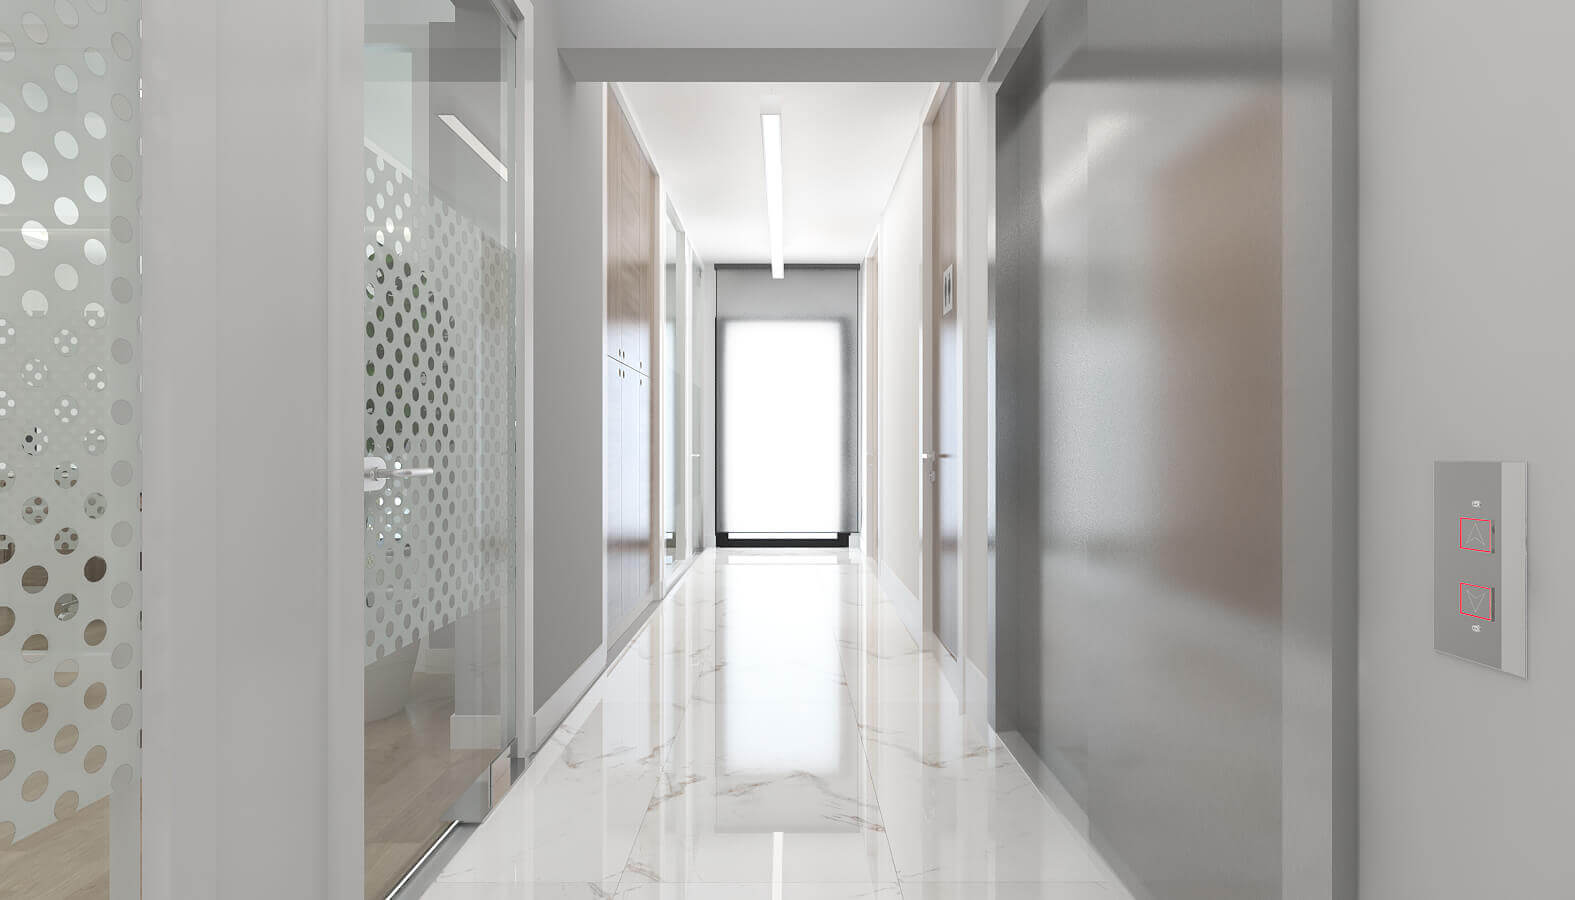 office design 3789 Telsam Telekom Offices